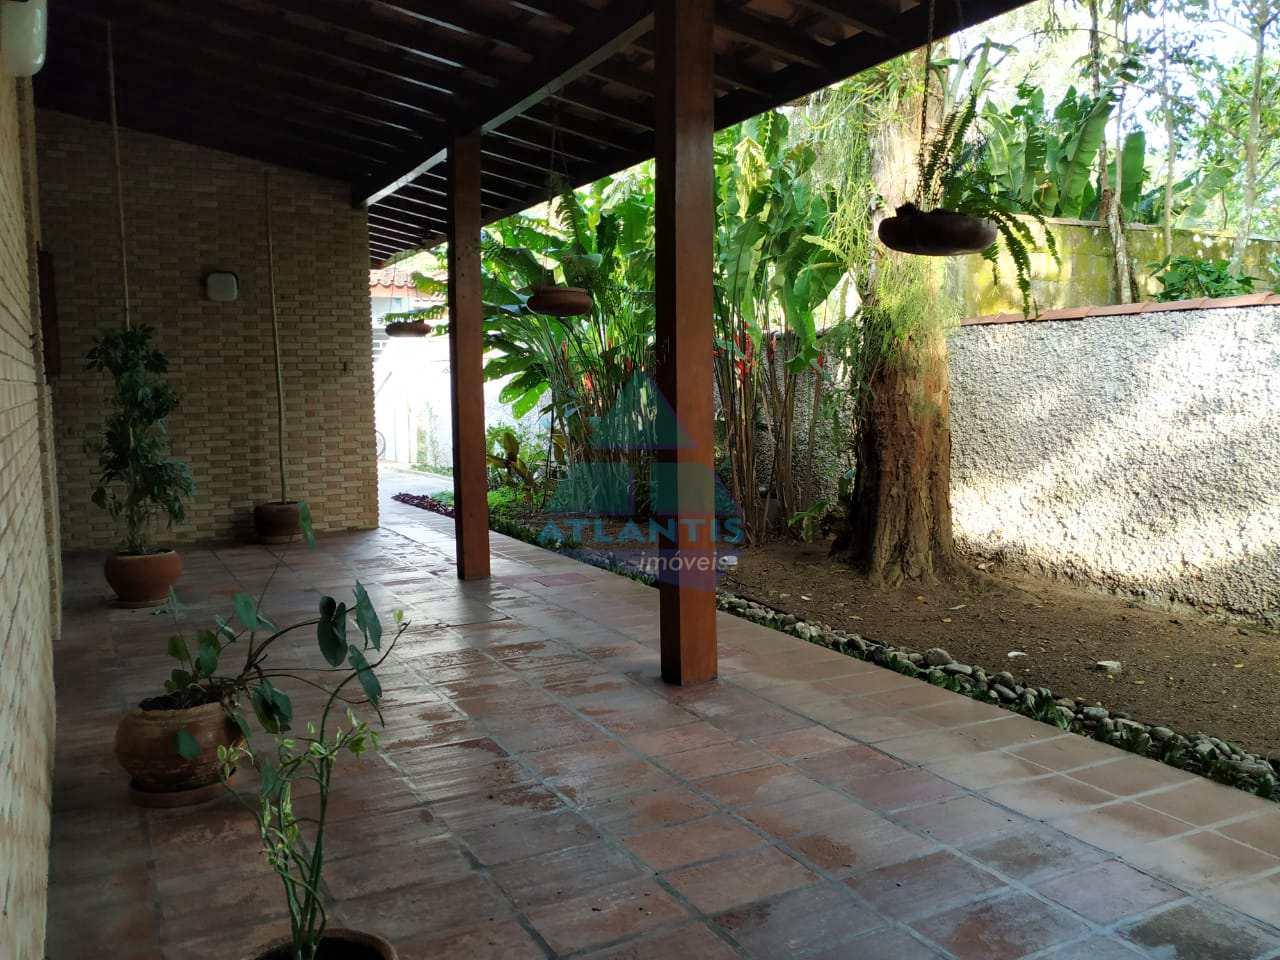 Casa com 5 dorms, Praia do Lázaro, Ubatuba - R$ 2.2 mi, Cod: 1143